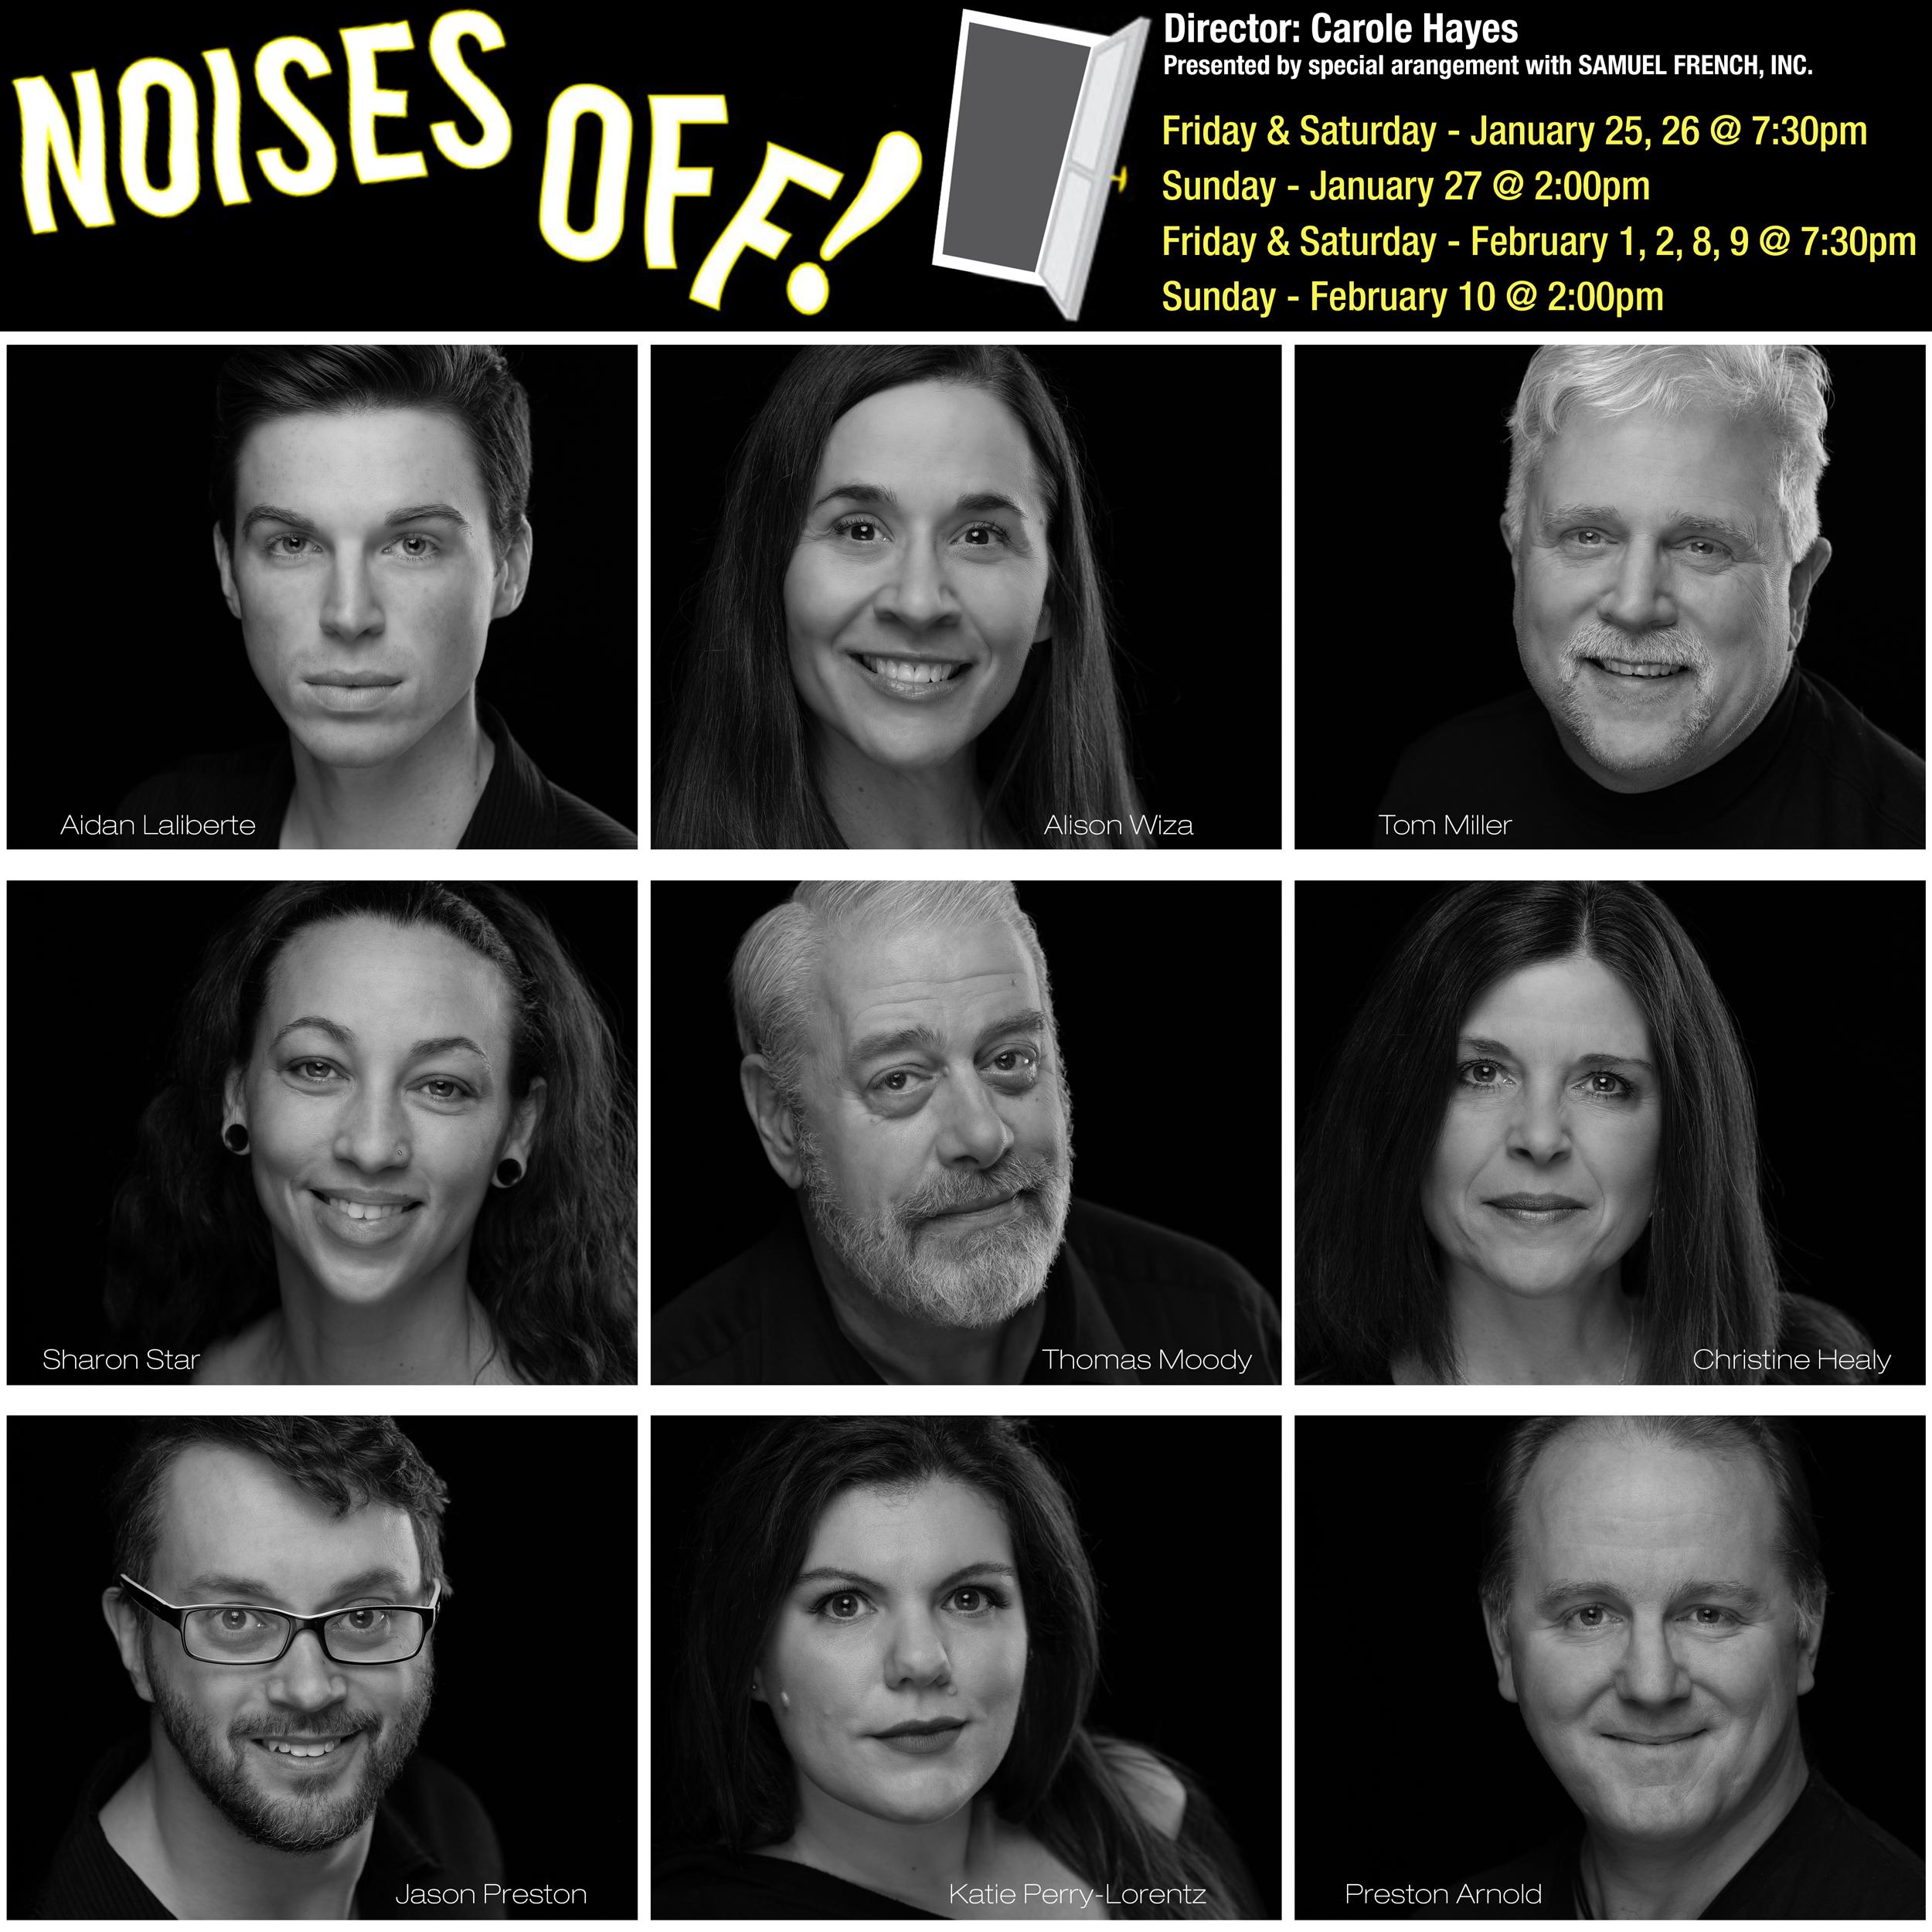 Noises-Off-Cast2500.jpg